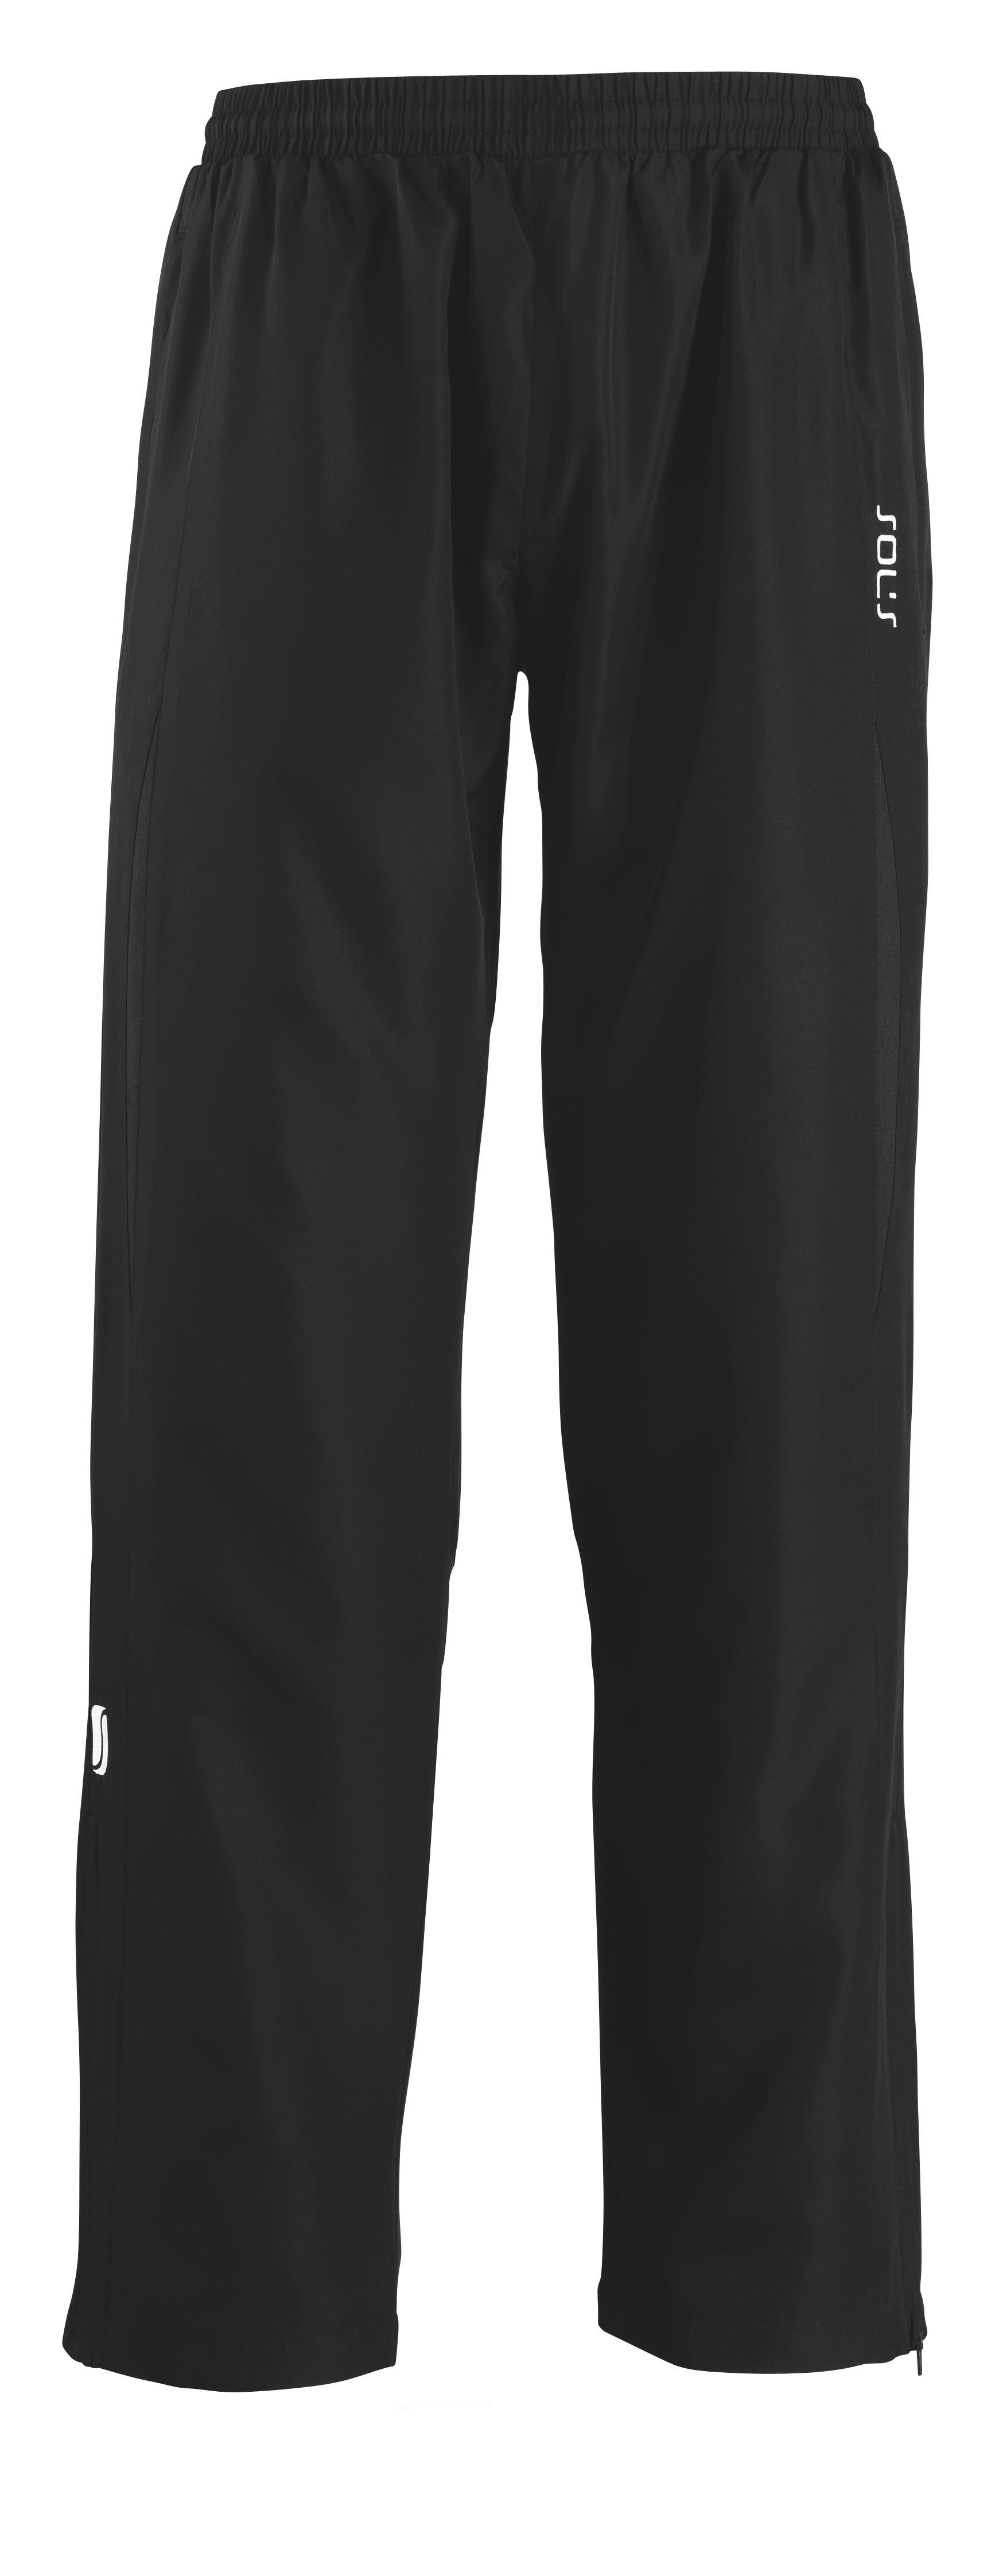 Old Trafford Pants